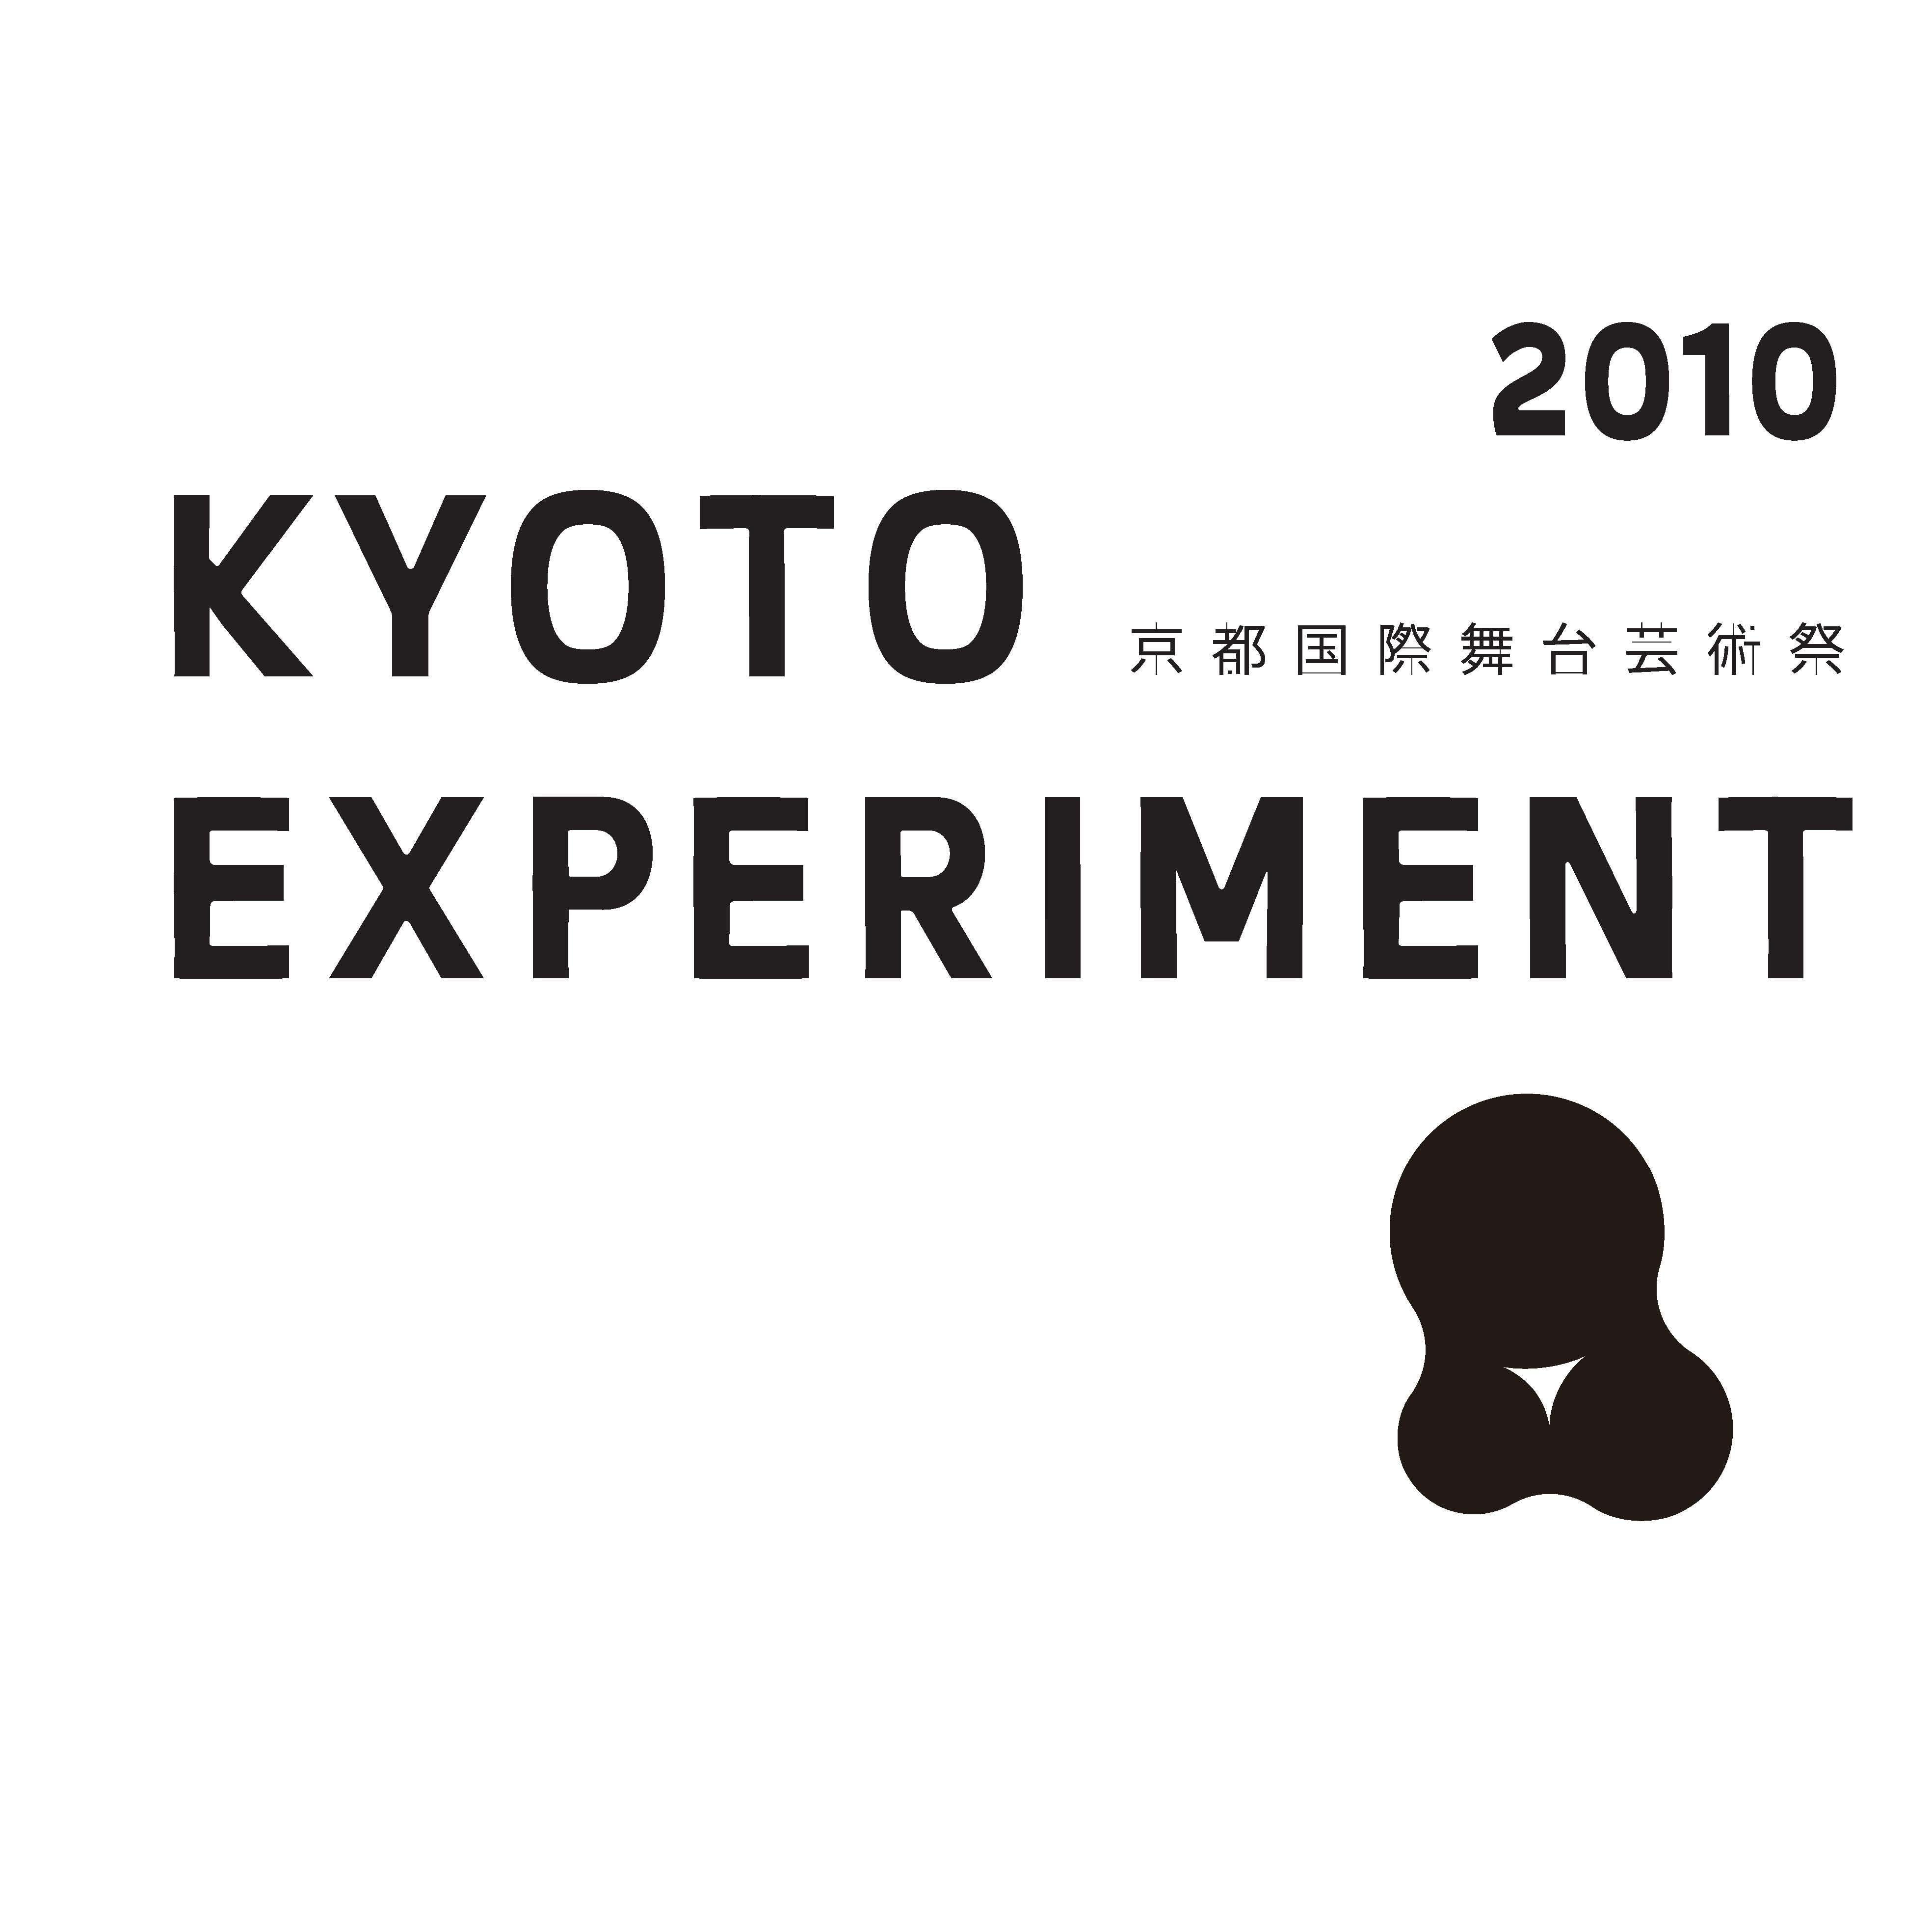 KYOTO EXPERIMENT画像1